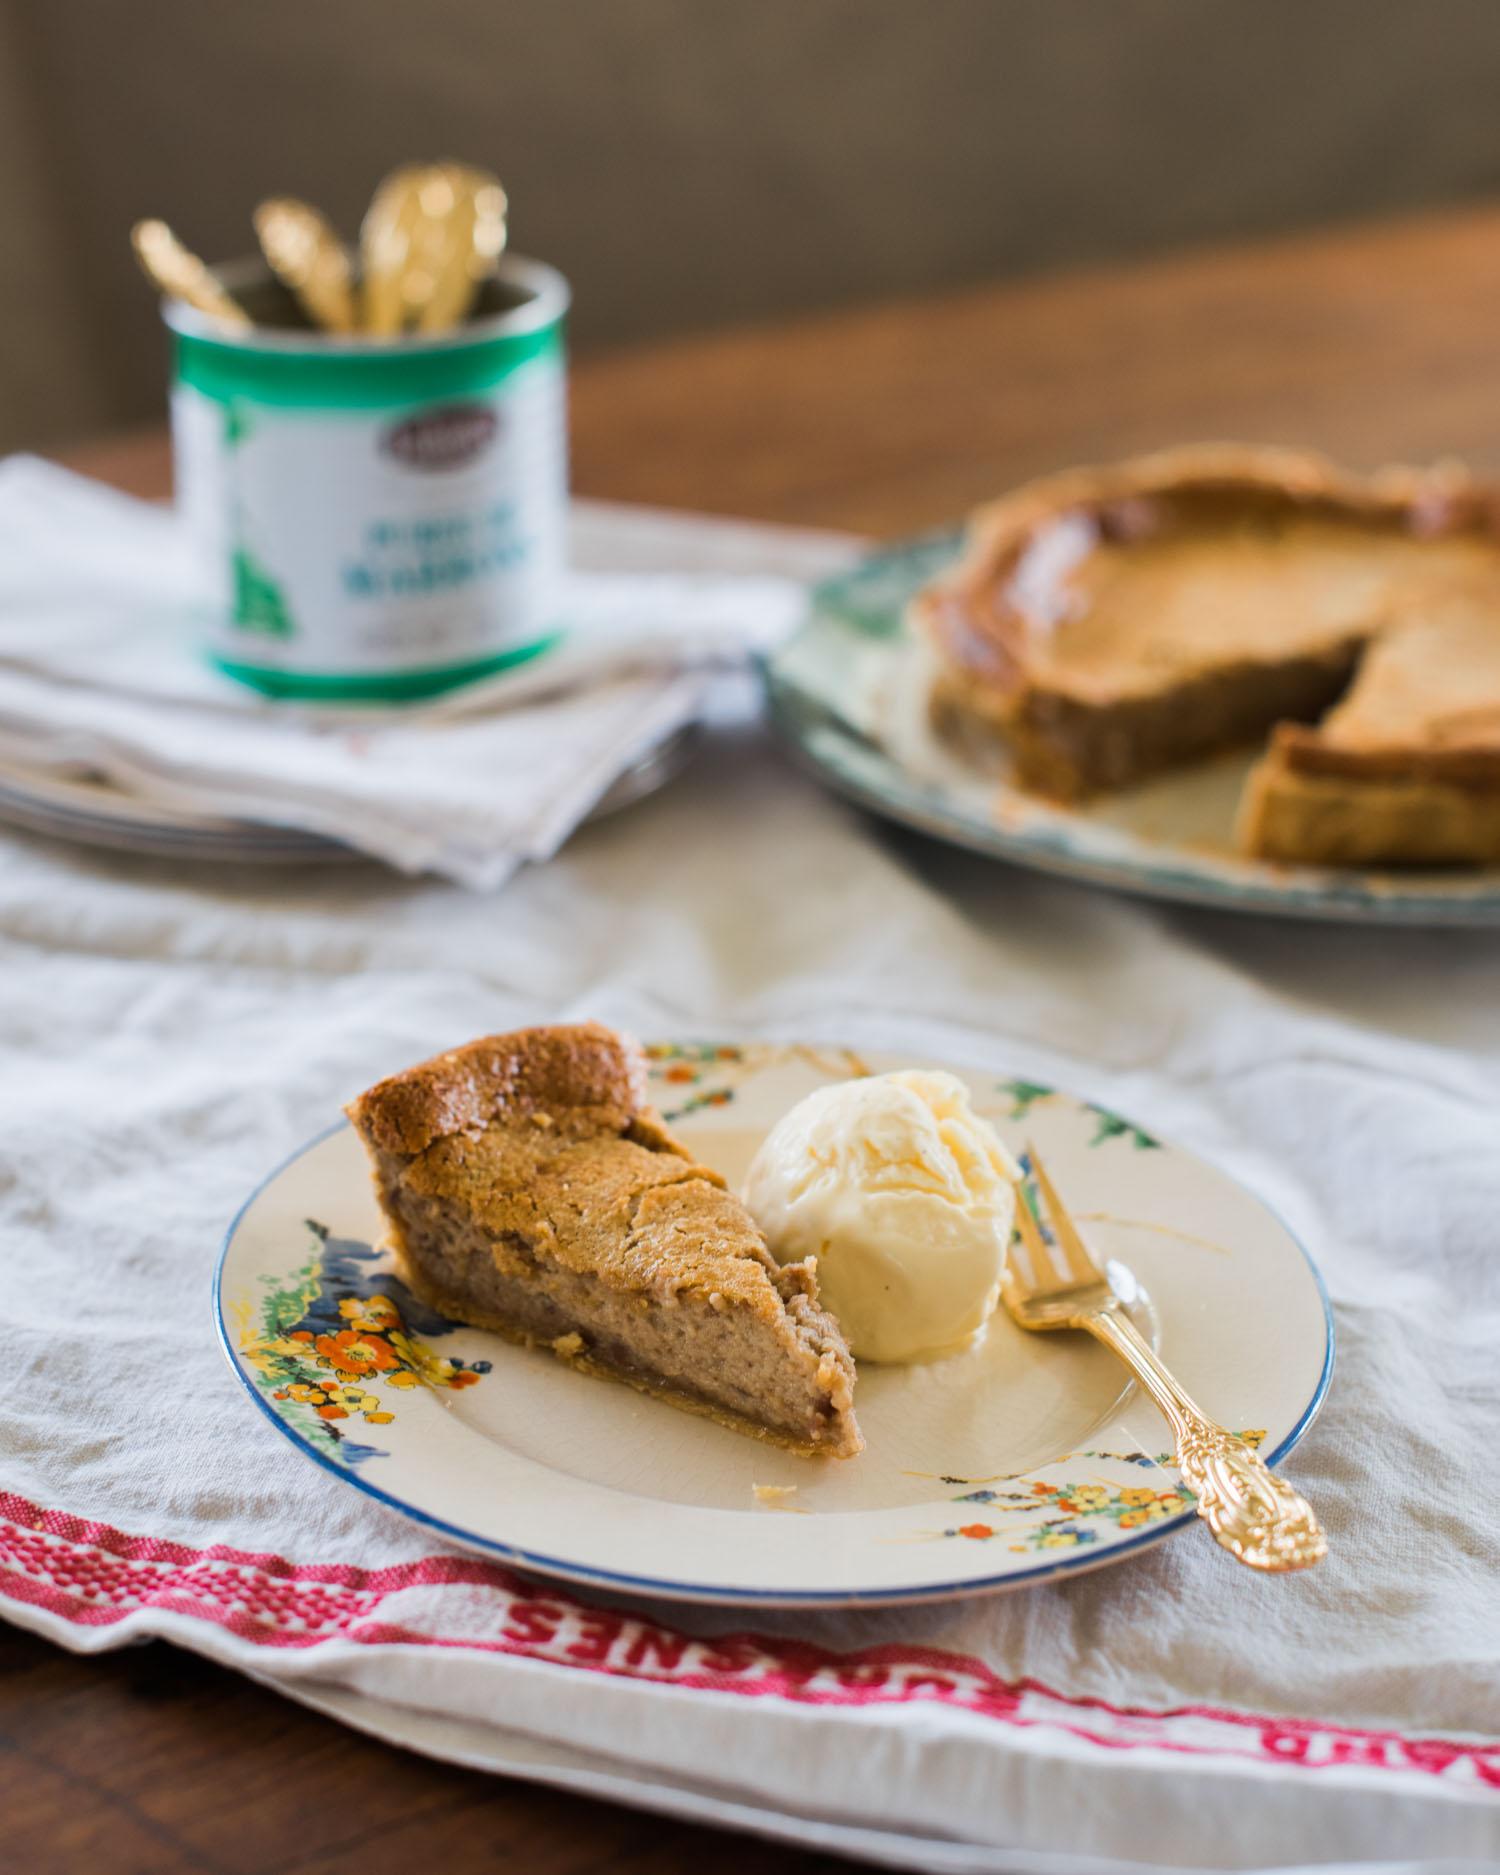 Tarte à la Crème de Marrons - Chestnut Cream Tart